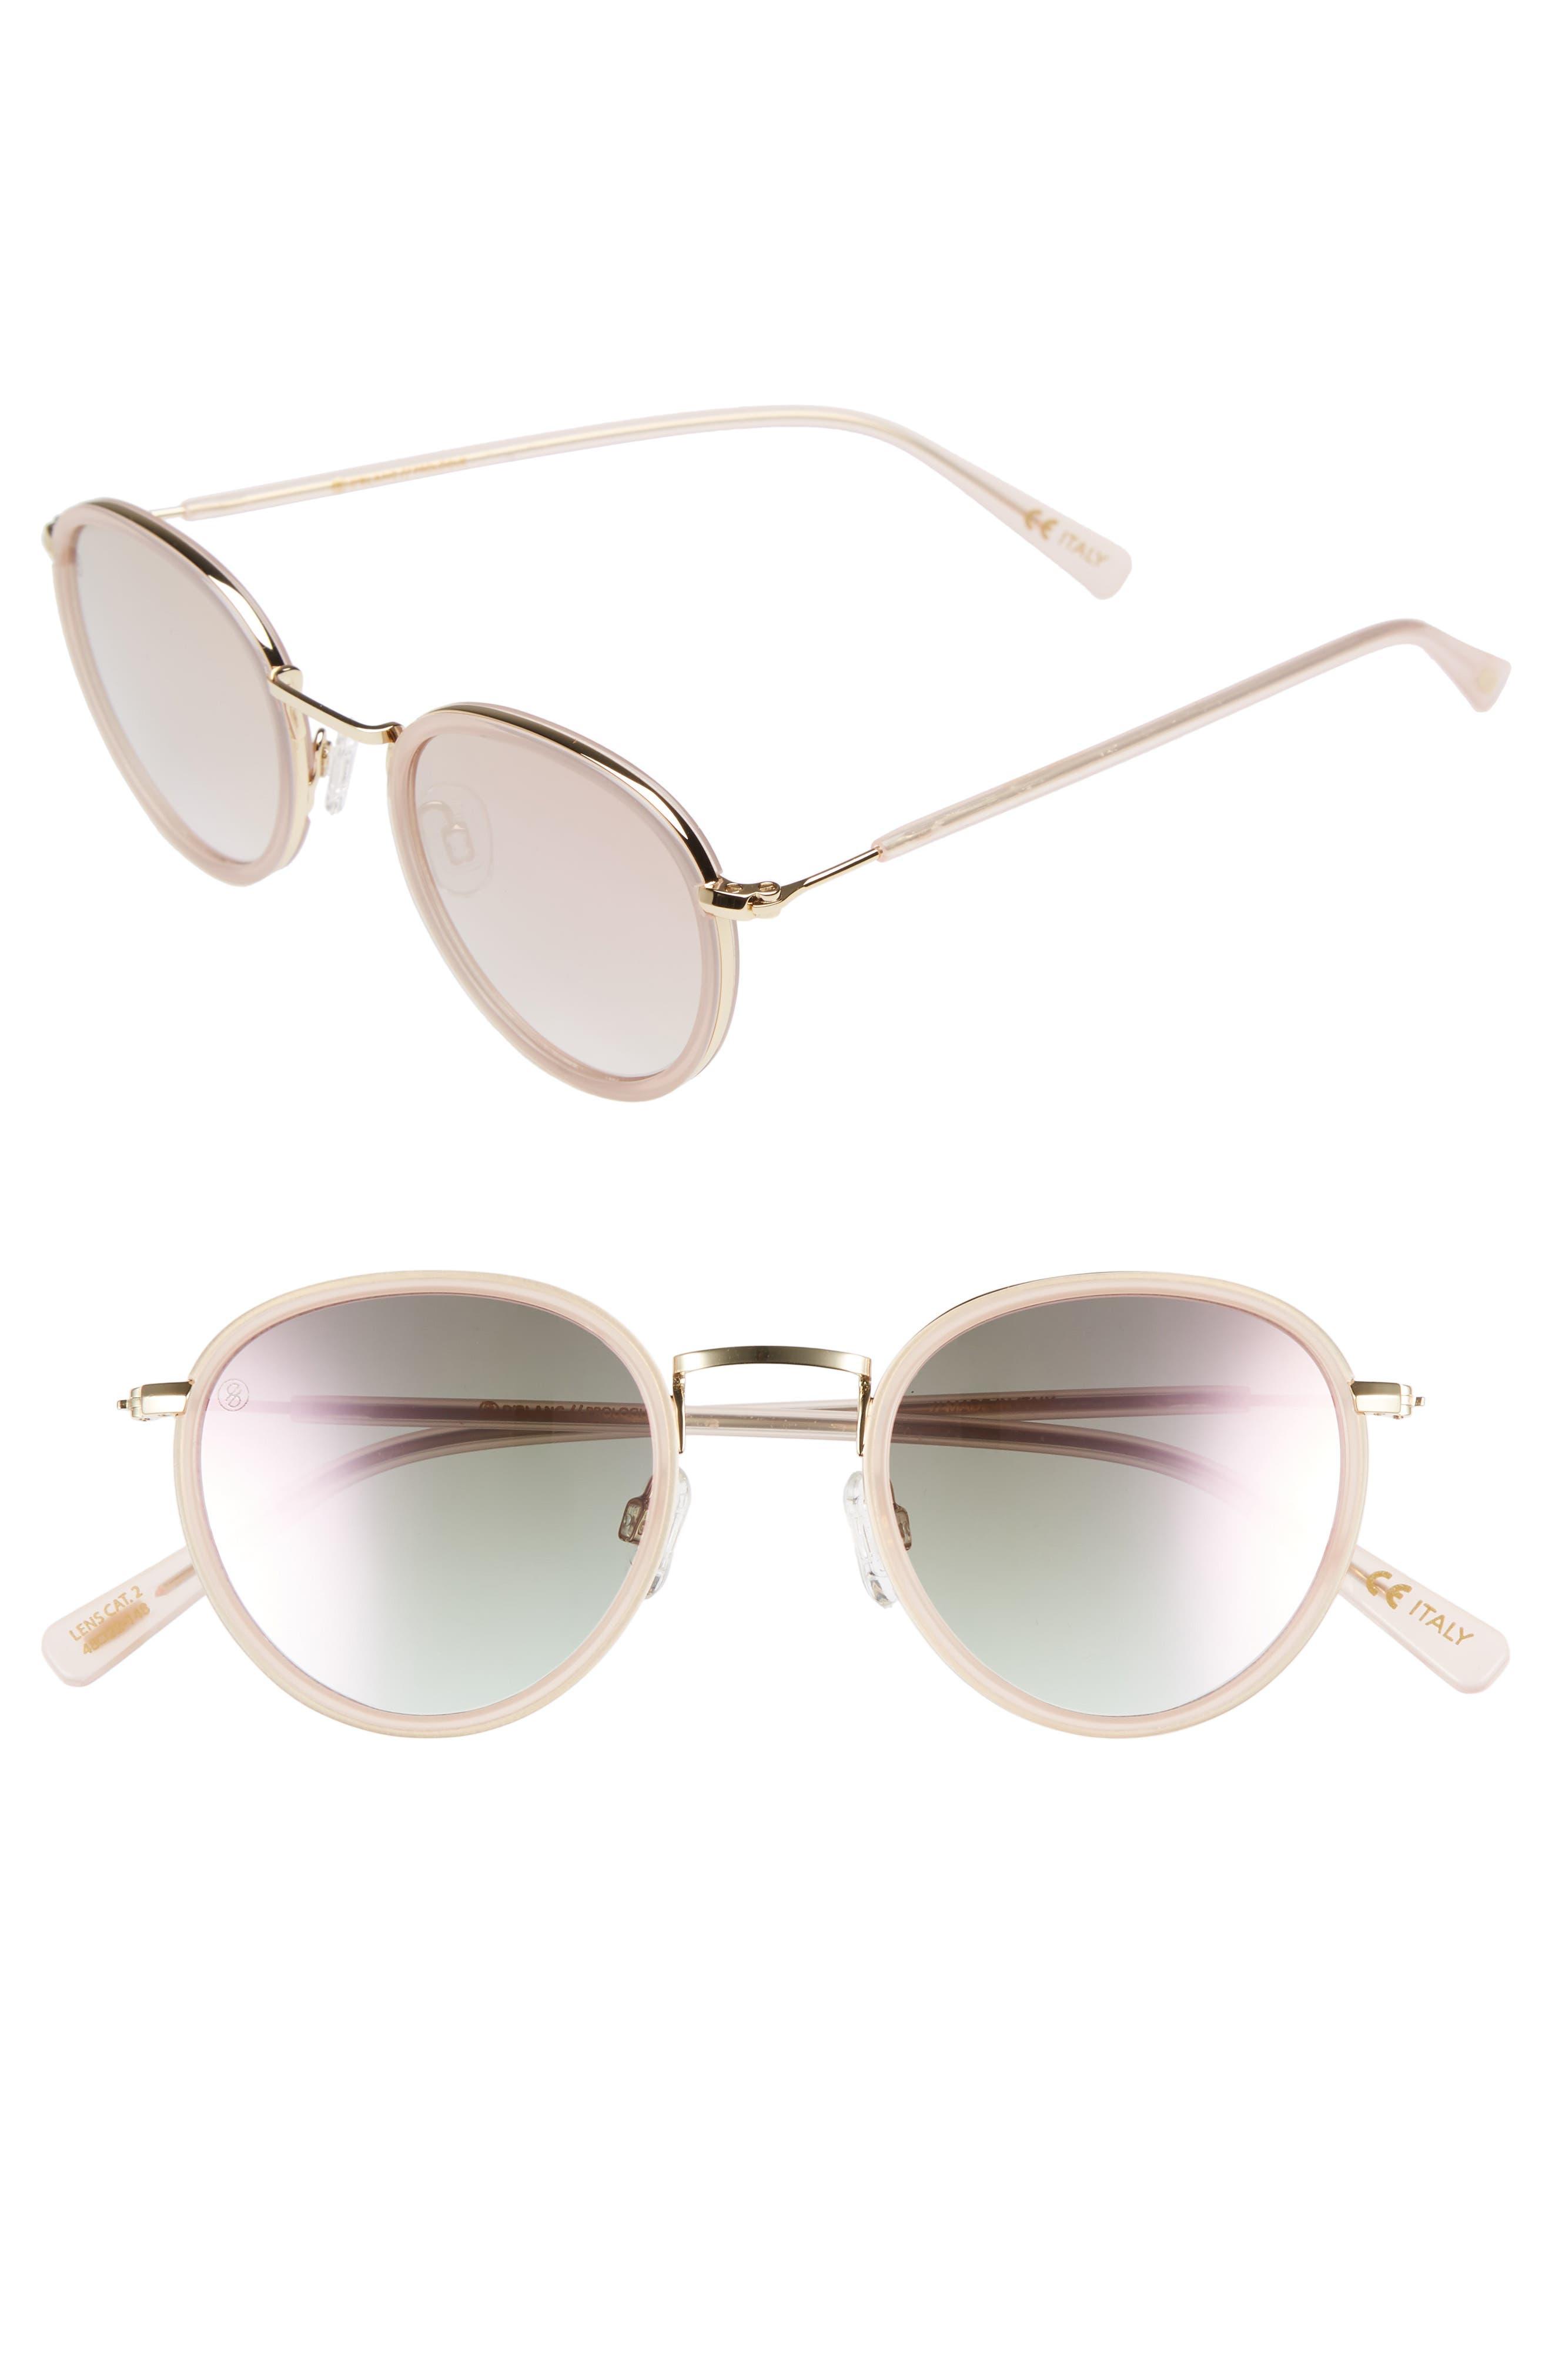 D'BLANC Prologue 48mm Round Sunglasses,                         Main,                         color, Blush/ Rose Flash